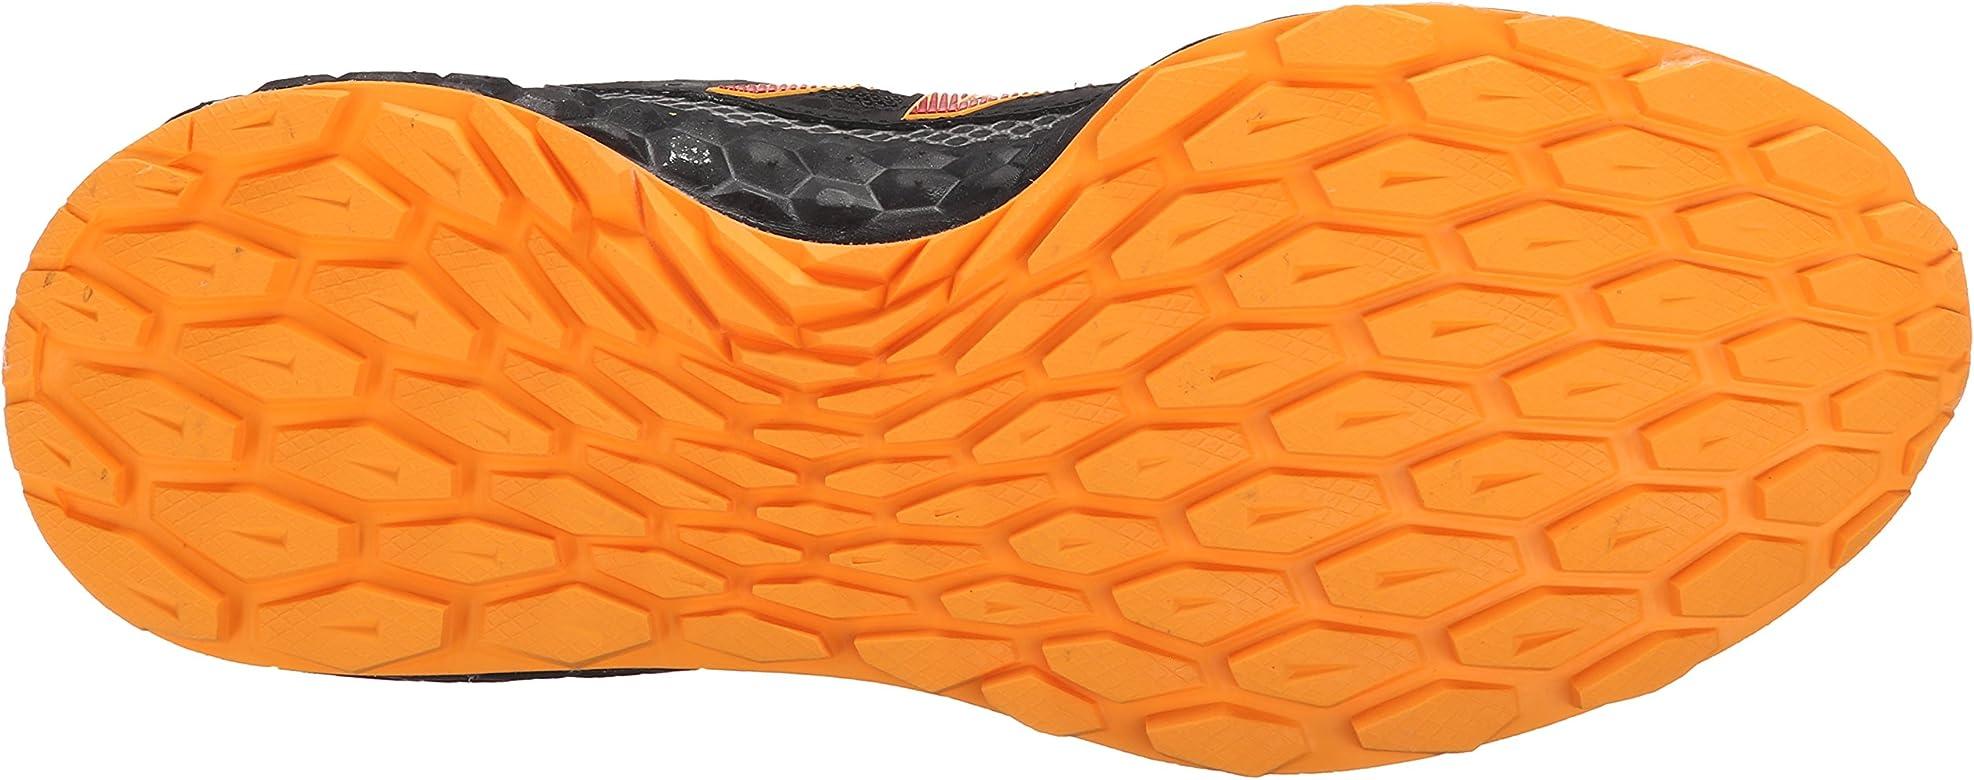 New Balance - Zapatillas para Correr en montaña para Hombre Negro Negro/Naranja: Amazon.es: Zapatos y complementos